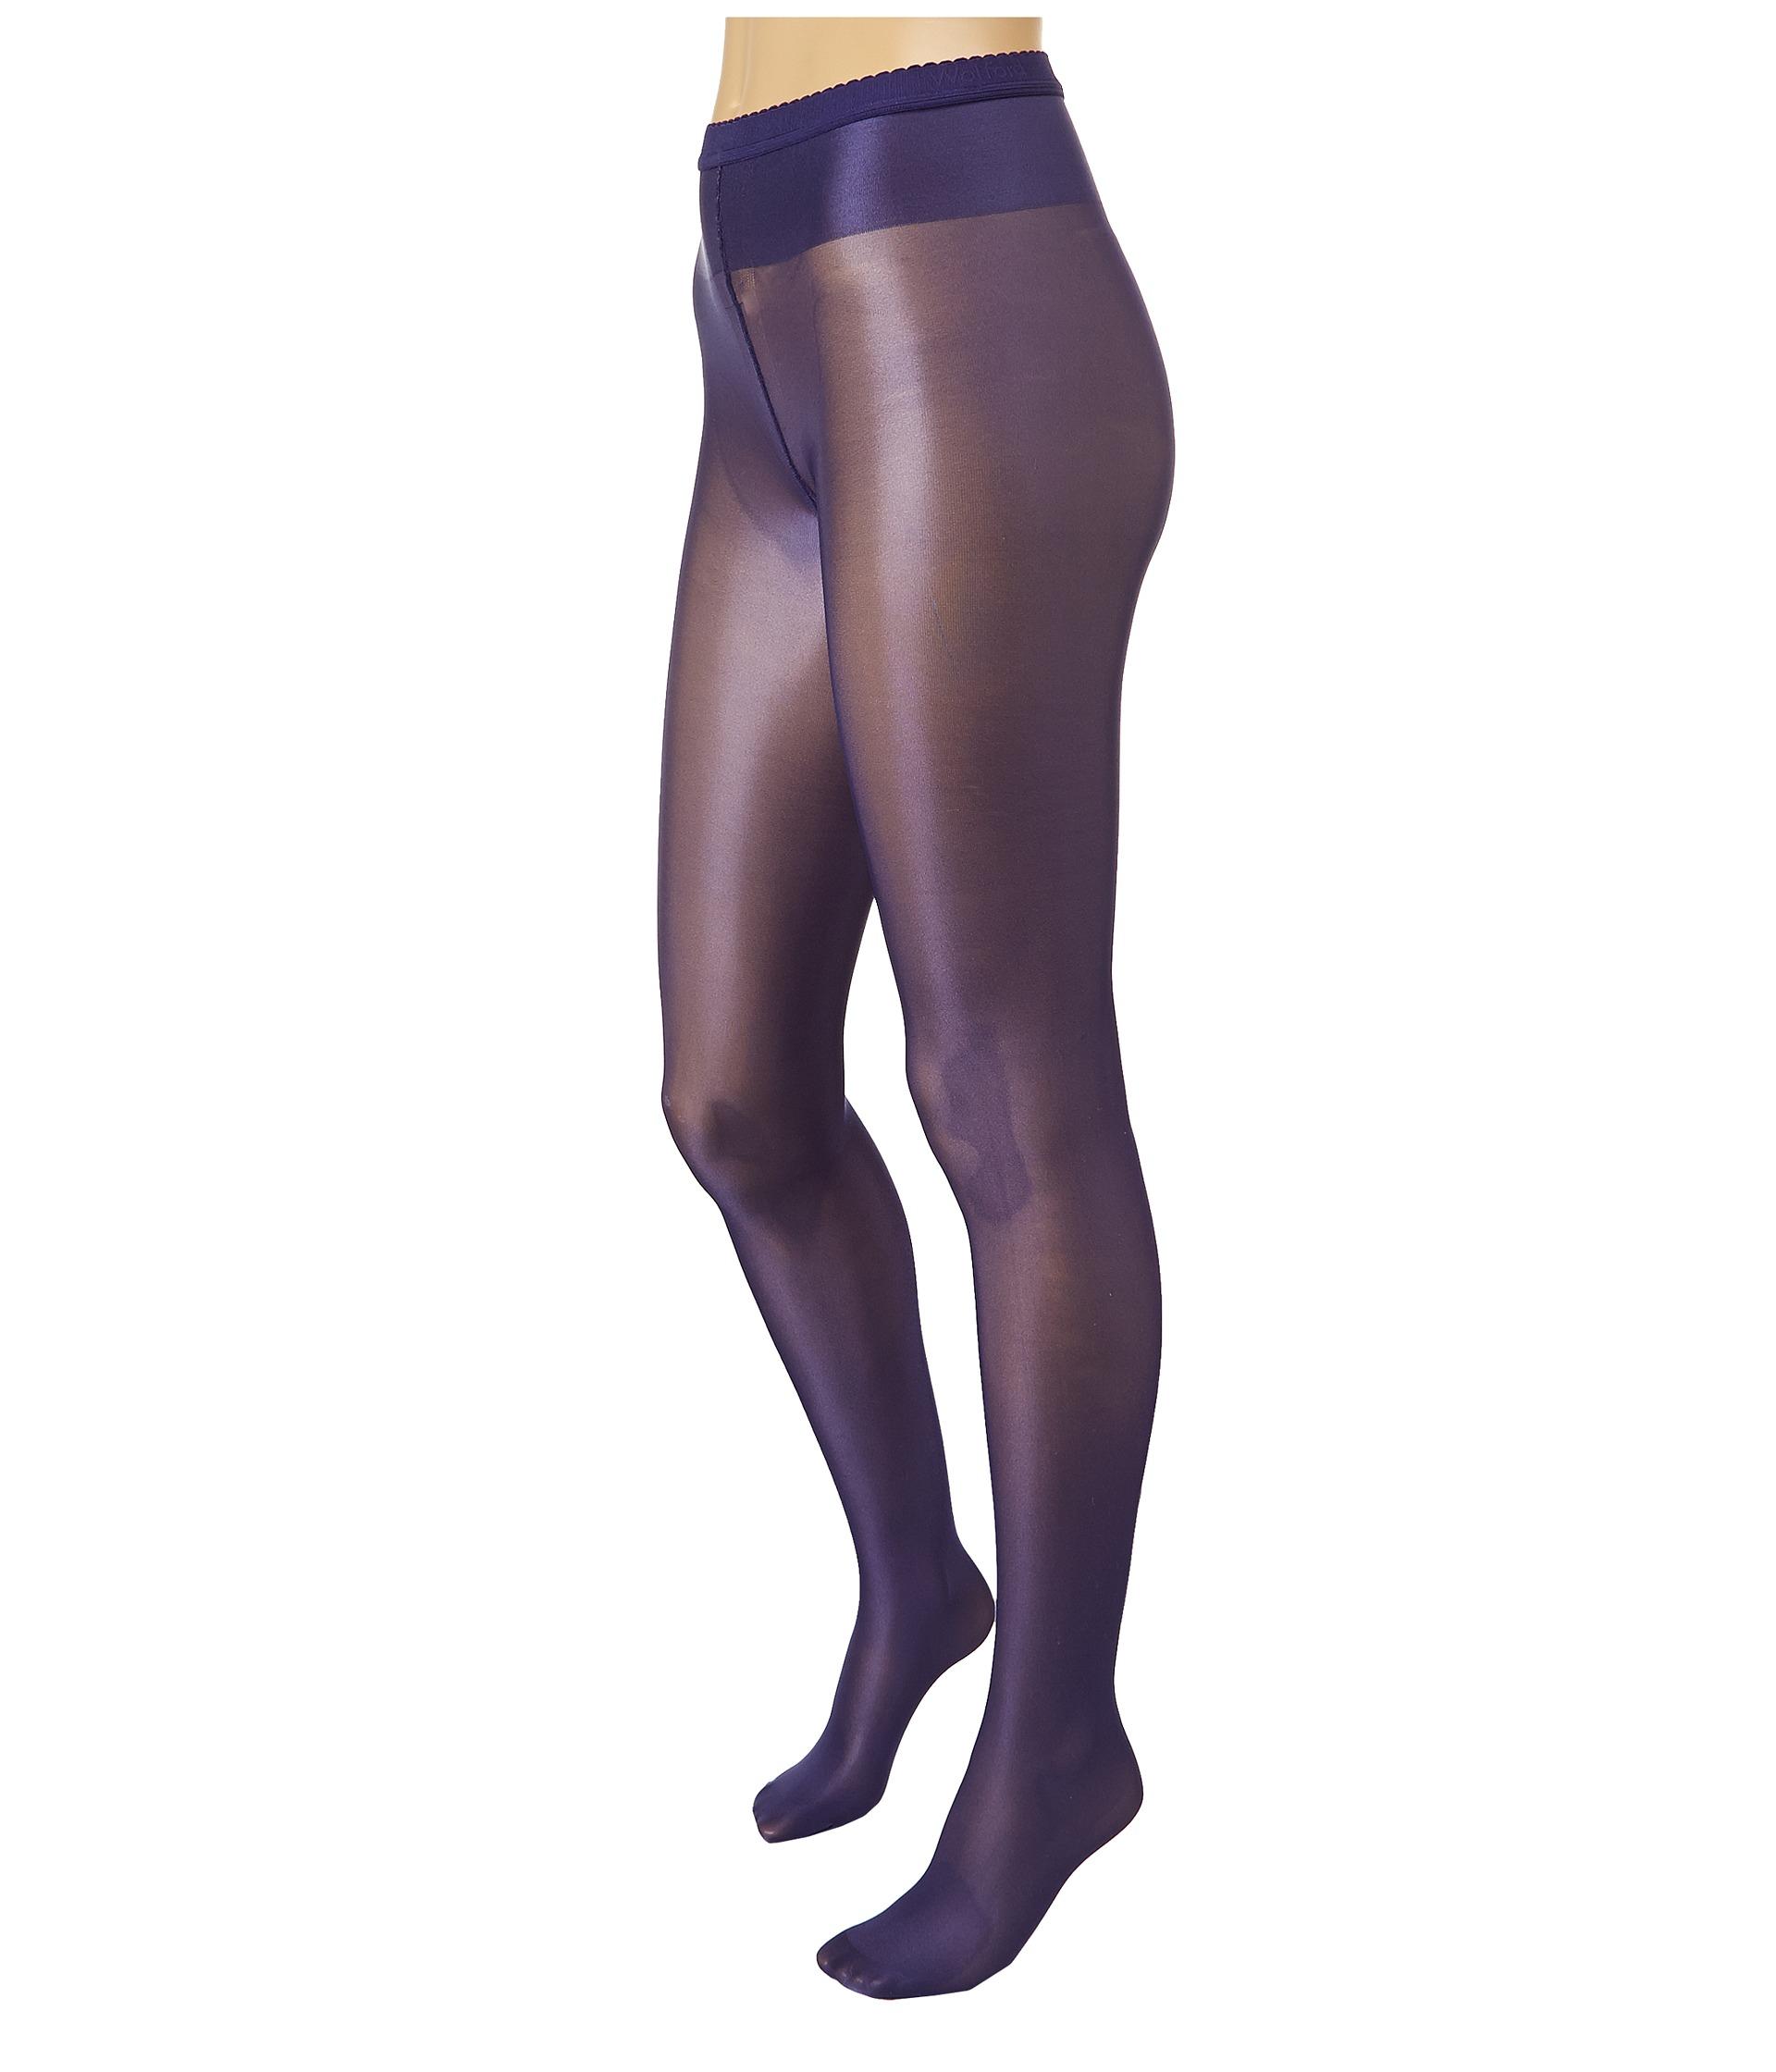 fb88d611b73 Wolford Neon 40 Tights in Purple - Lyst